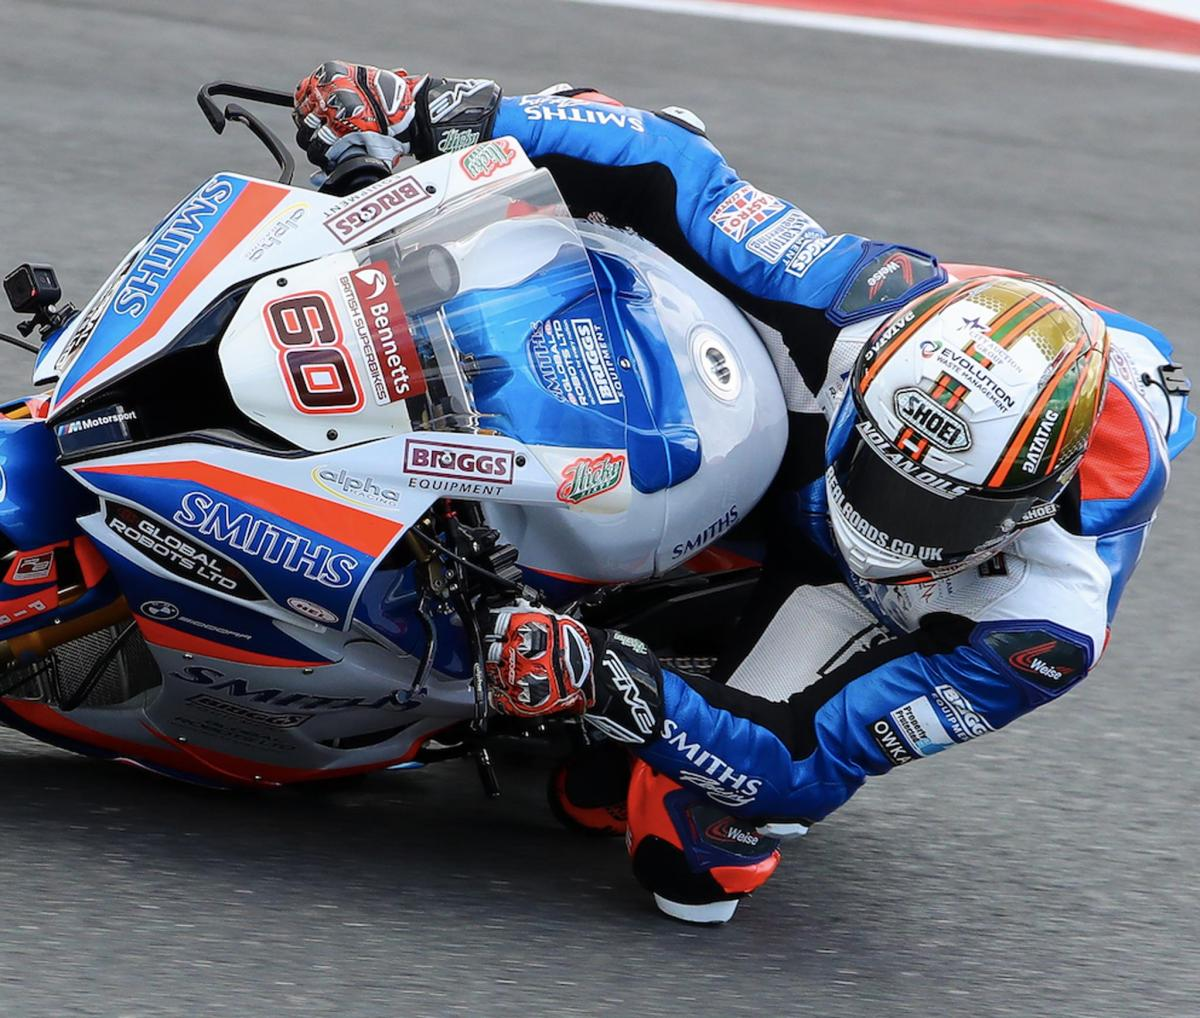 TT star Hickman dominates Ulster GP | Visordown